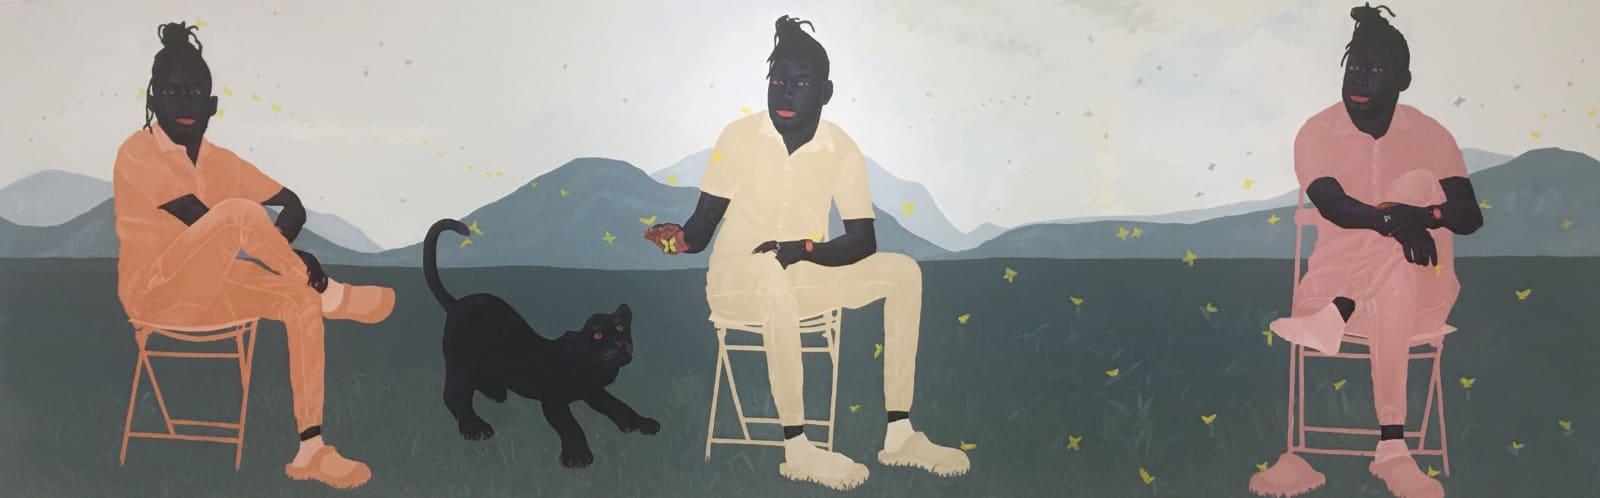 Kwesi Botchway, Metamorphose in July, 2020